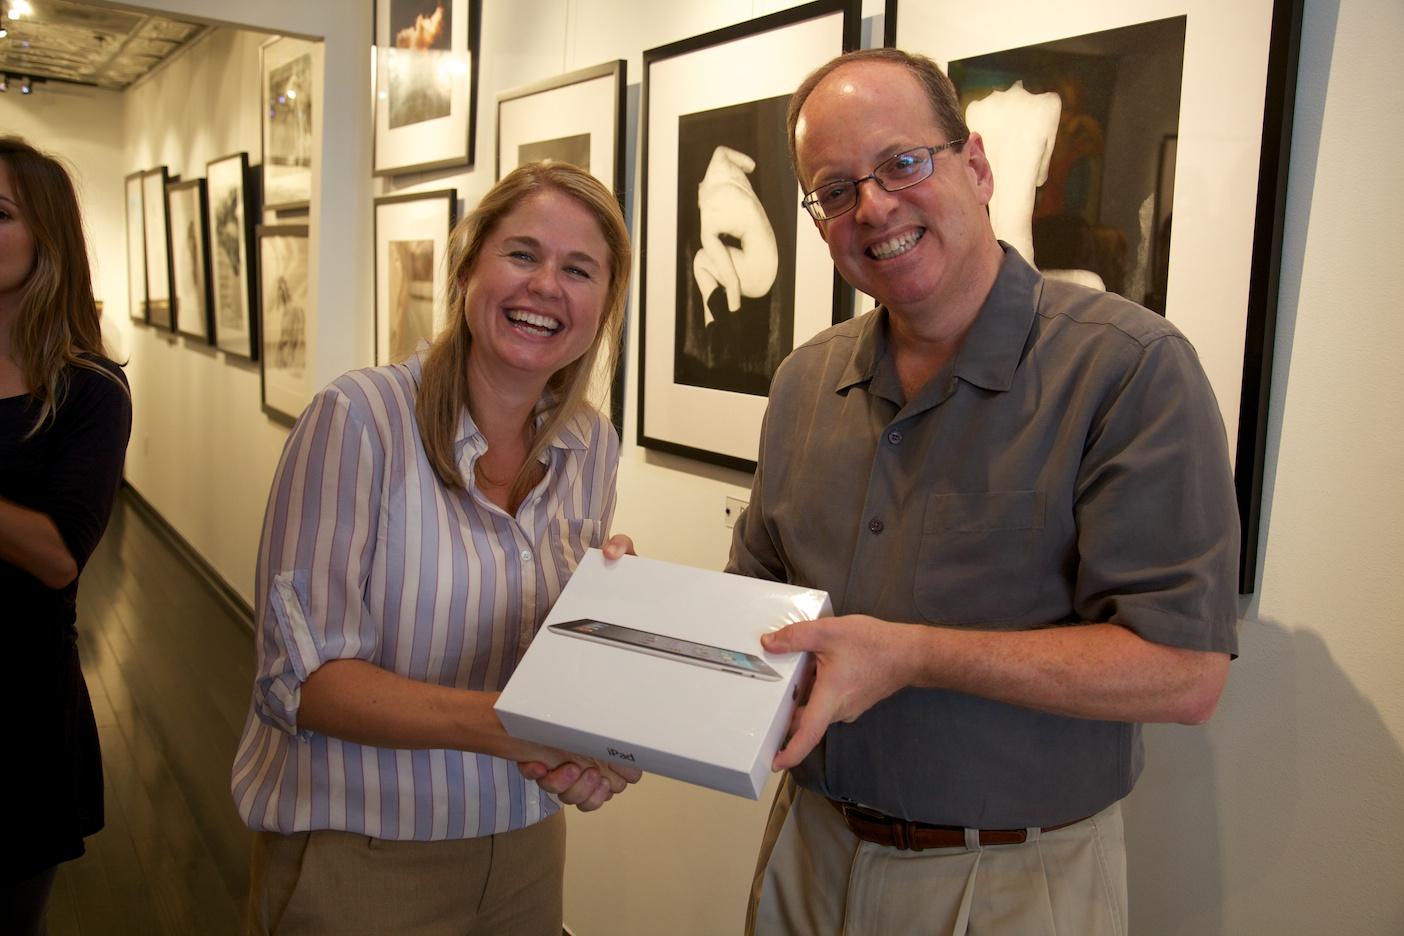 Winner of iPad raffle, Sydney Godfrey of PBI Commercial Interiors, and gallery chairman, Russell Medford